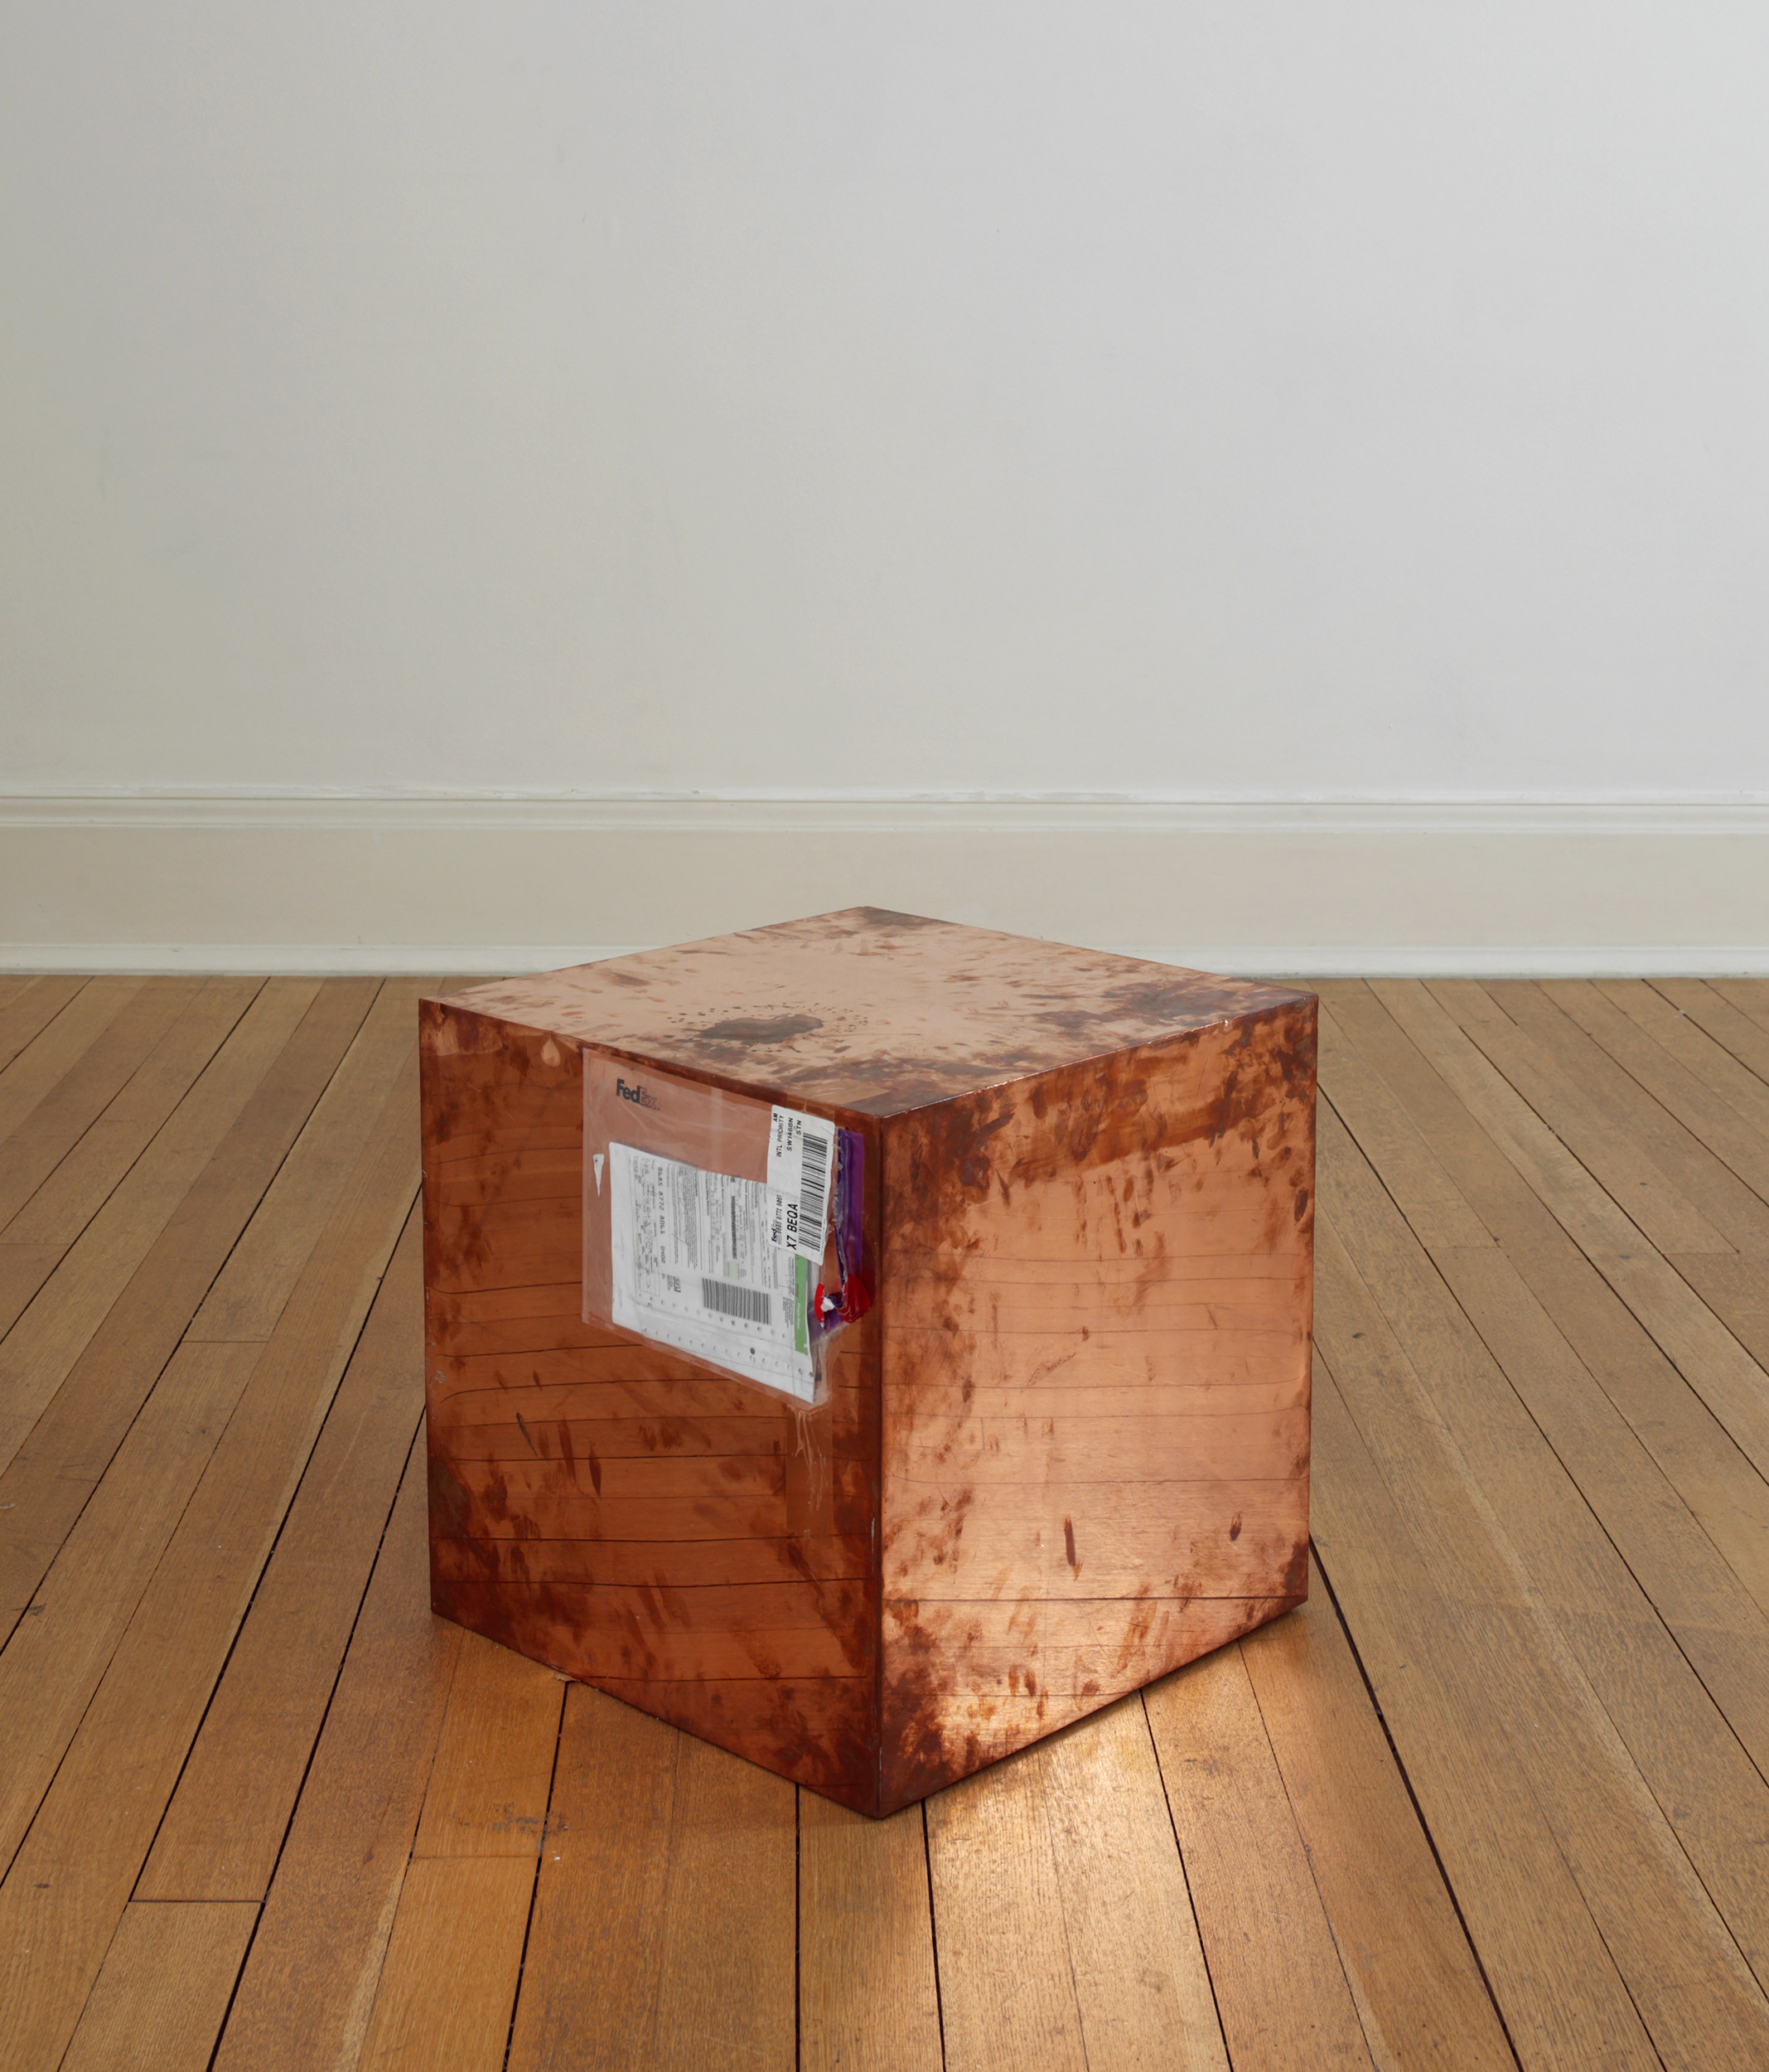 FedEx® Large Kraft Box  © 2005 FEDEX 330508 REV 10/05 SSCC, International Priority, Los Angeles–London trk#868587728061, October 2–5, 2009, International Priority, London–Zurich trk#863822956490, November 26–December 2, 2009   2009–  Polished copper, accrued FedEx shipping and tracking labels  20 x 20 x 20 inches   FedEx Copper Works, 2009–    Production Stills, 2009